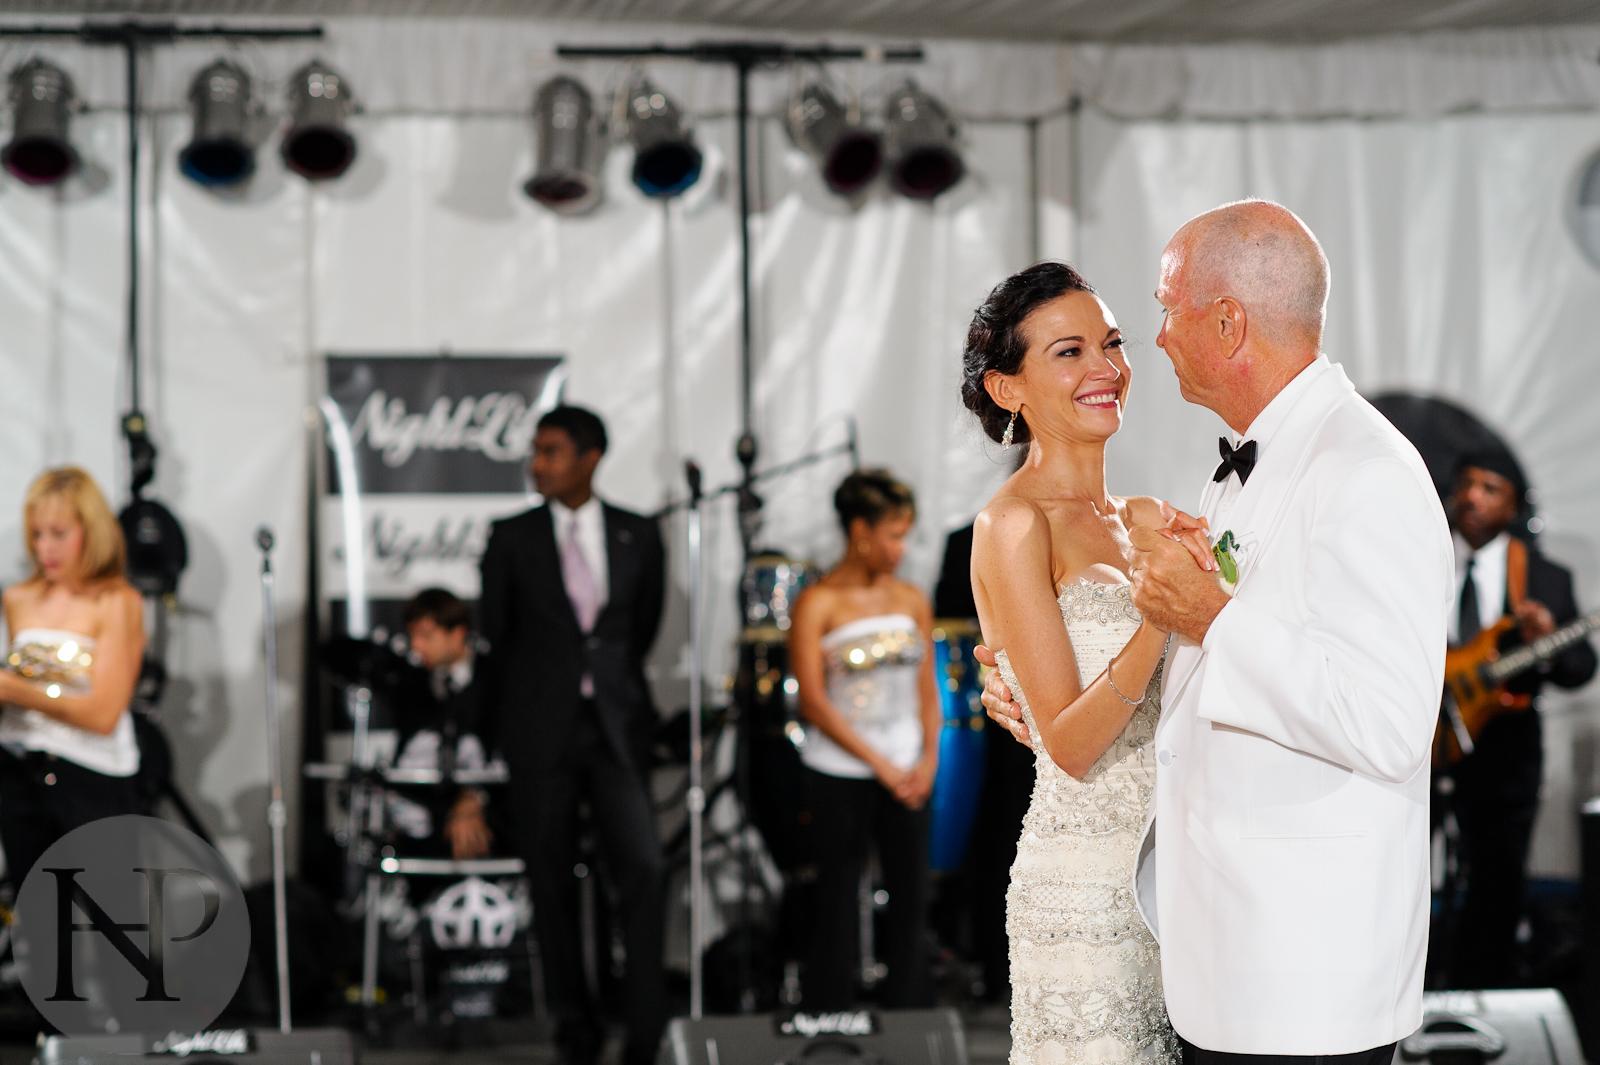 wedding photography dc photographer - district of columbia photography weddingphoto 2012_ kara matt - annapolis md - destination wedding-40.jpg